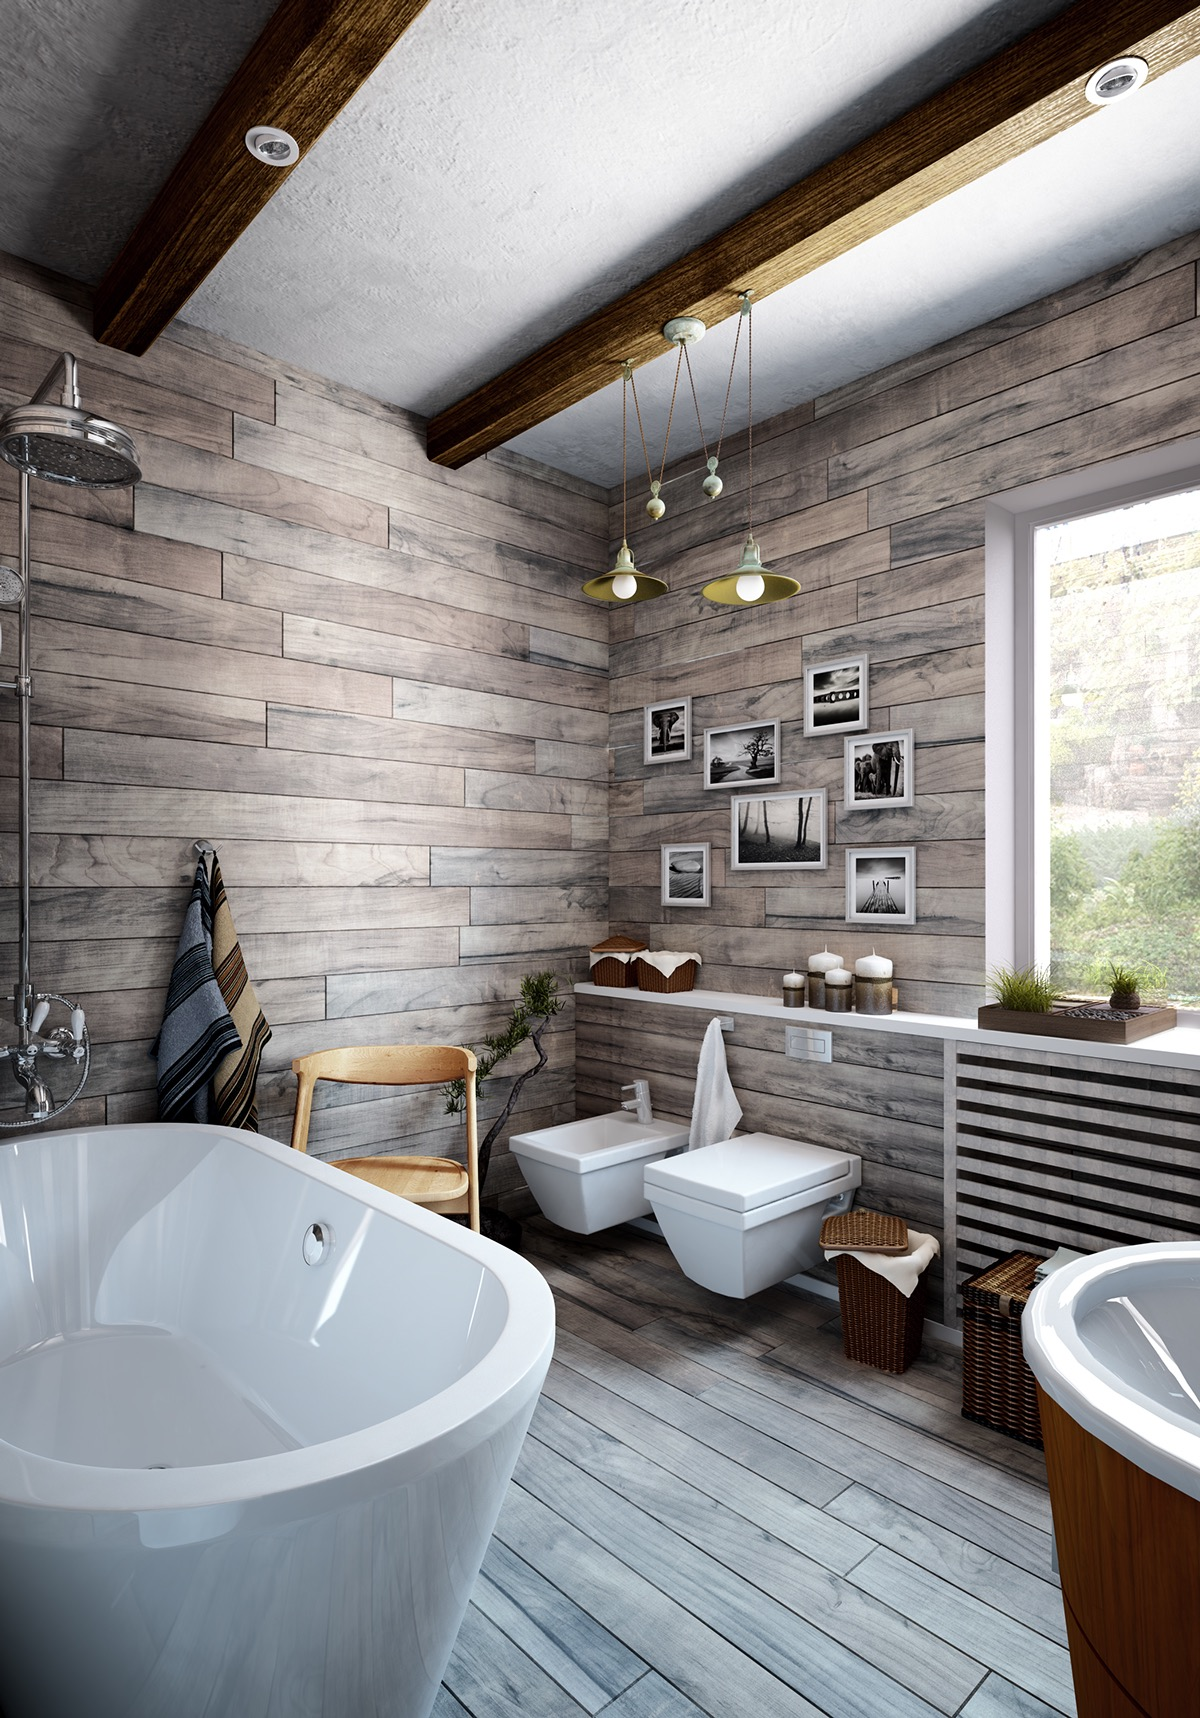 Modern Bathroom Design Ideas Using a Wooden Accent As The ... on Main Bathroom Ideas  id=42893